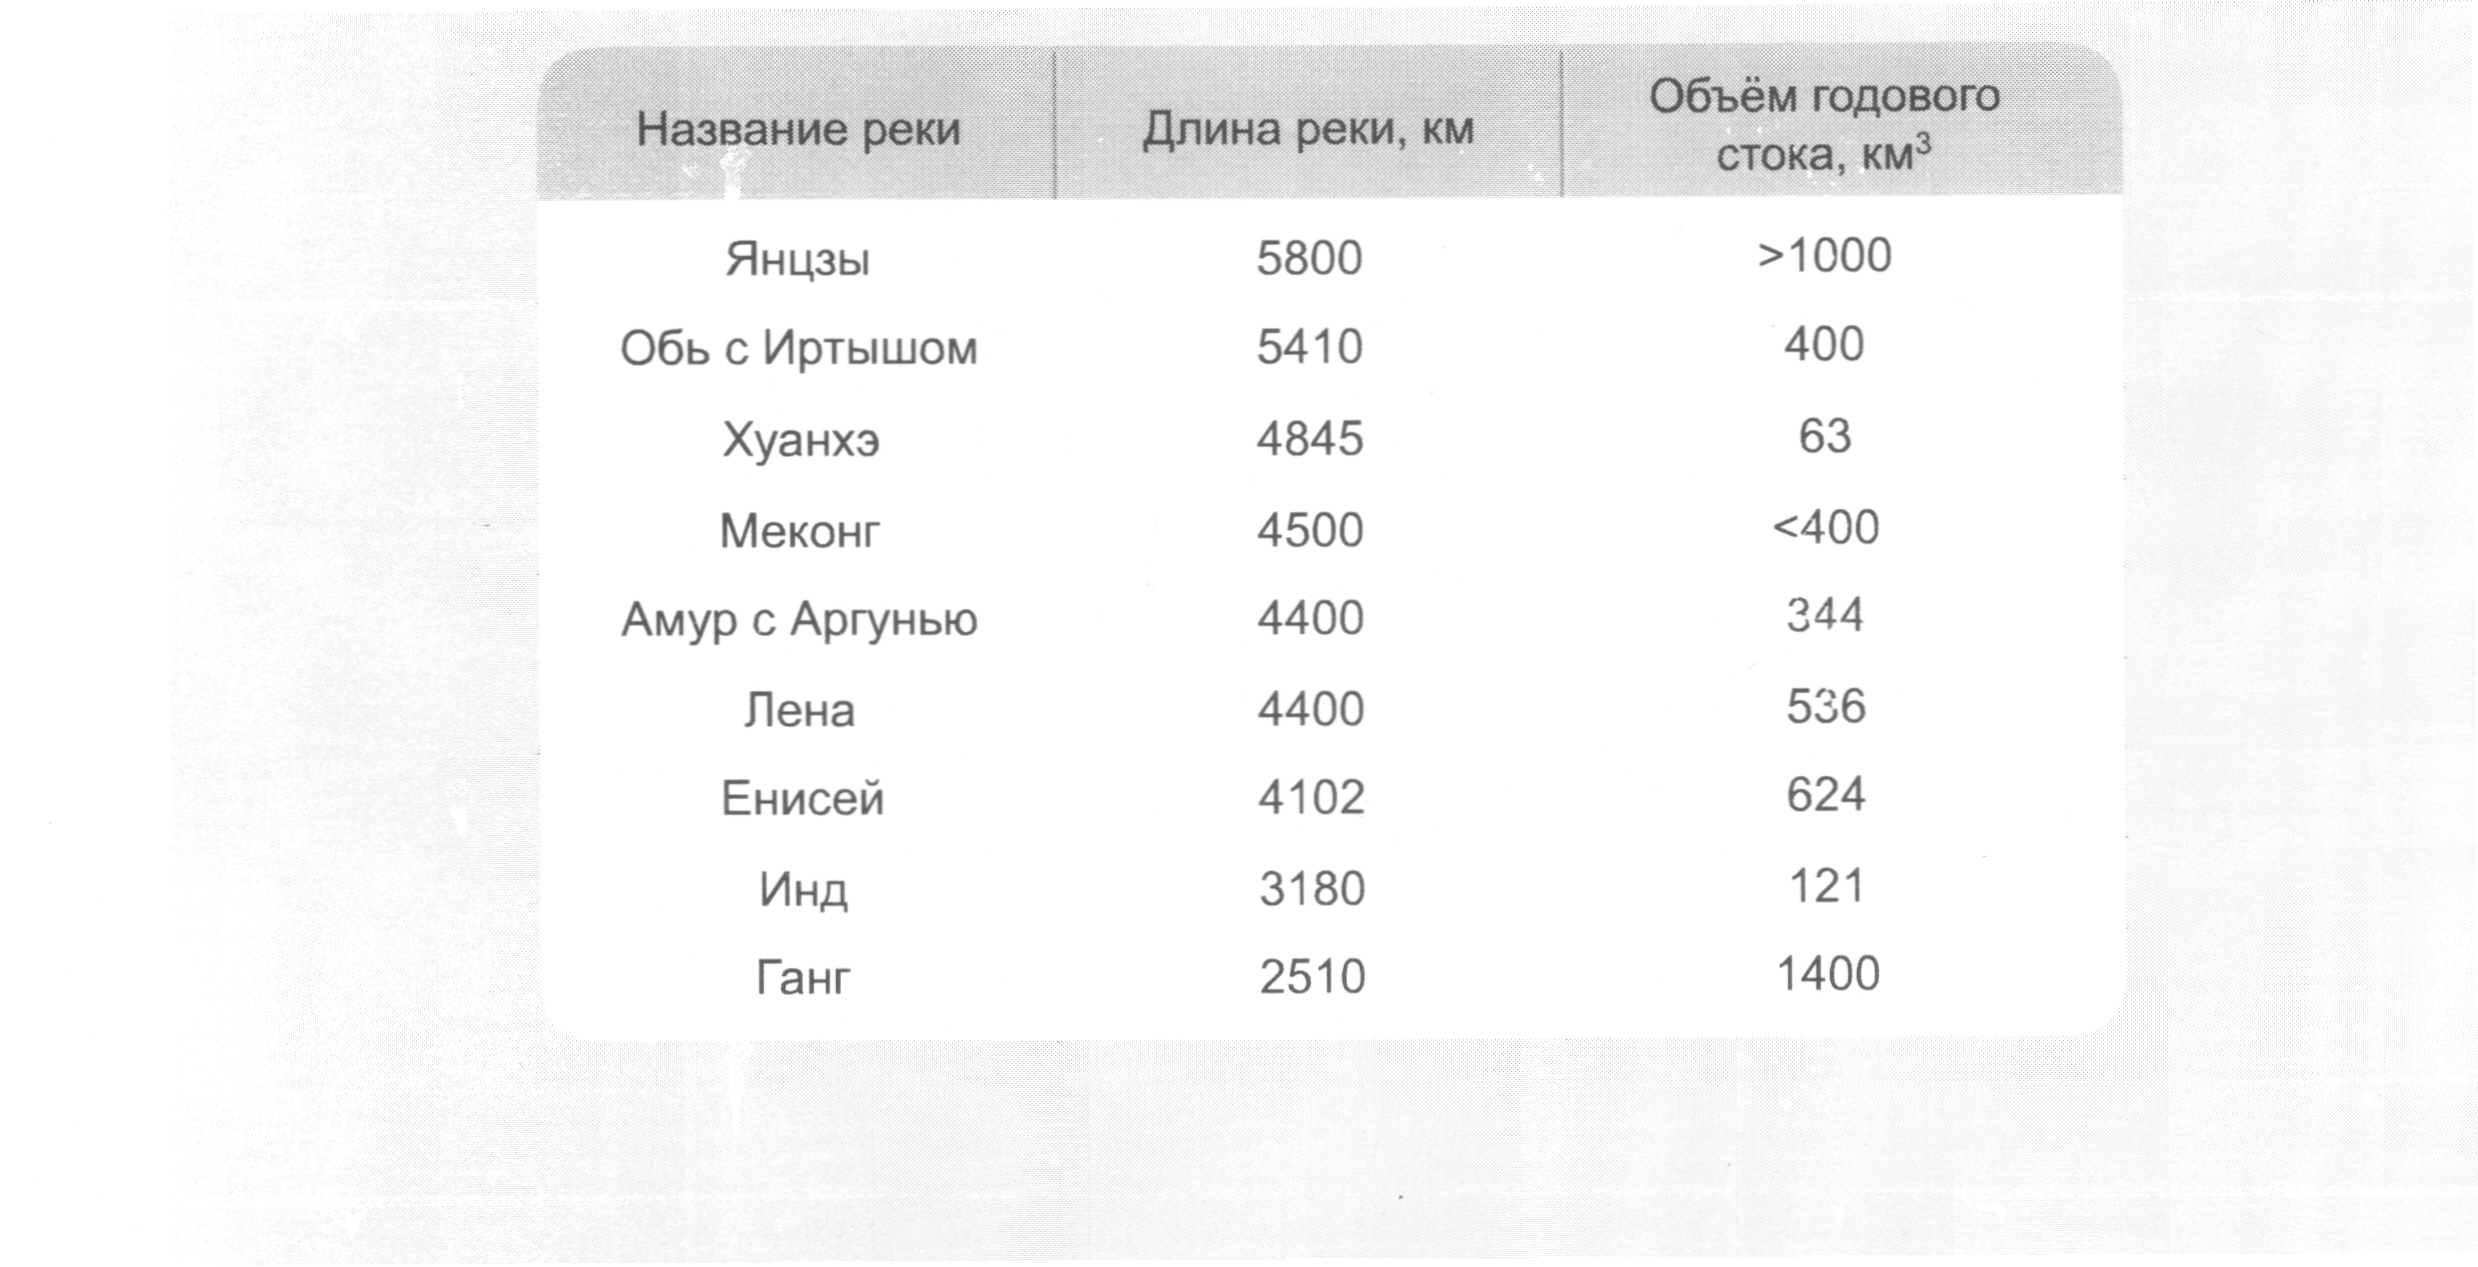 C:\Documents and Settings\User\Рабочий стол\Новая папка (11)\реки_000.jpg